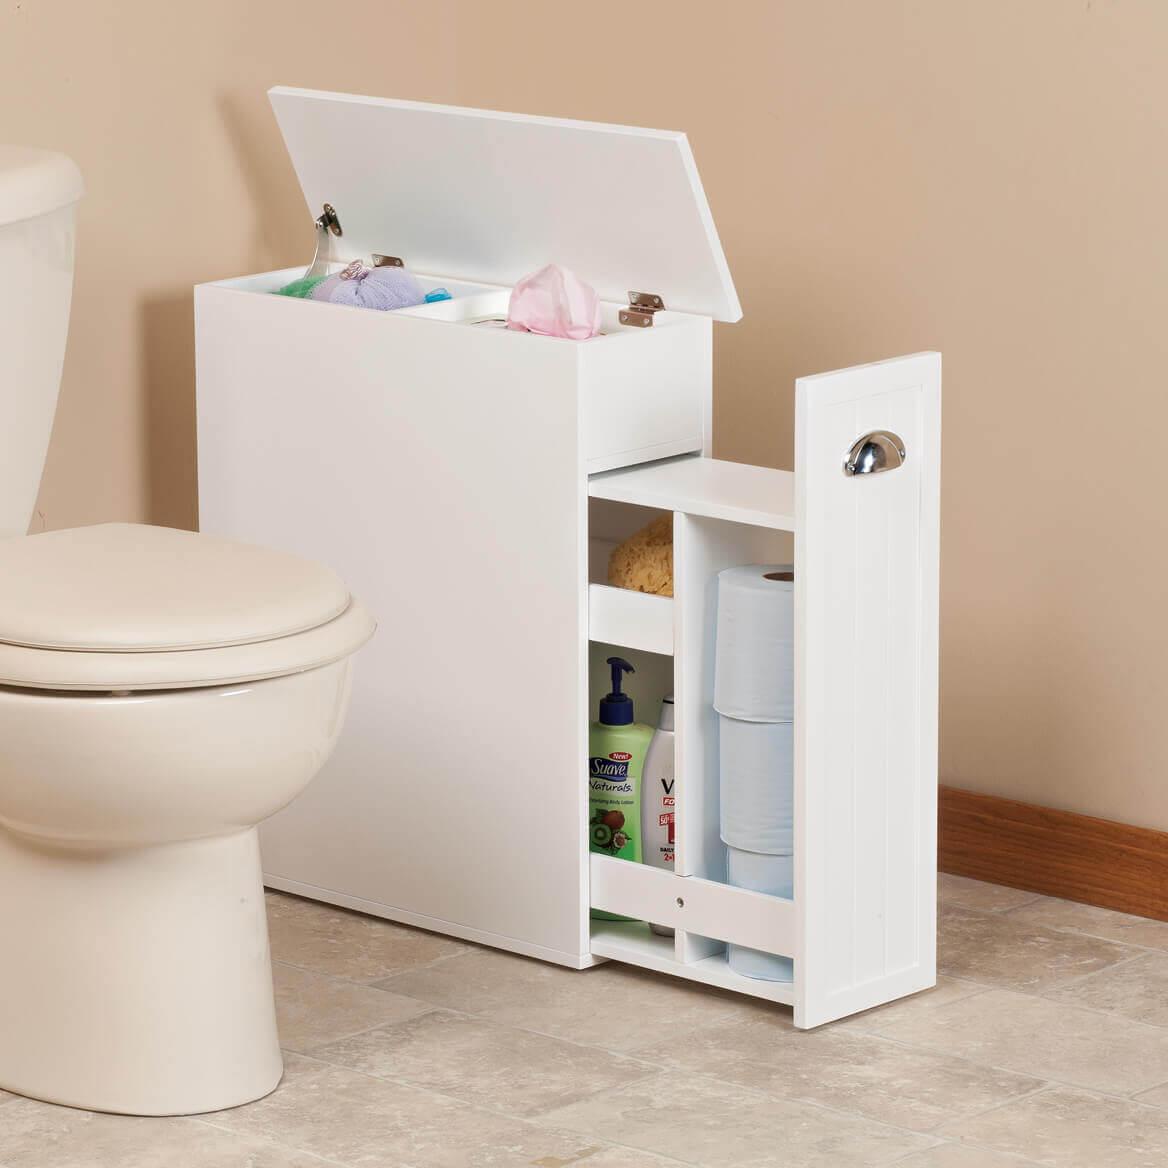 Install Bathroom Storage